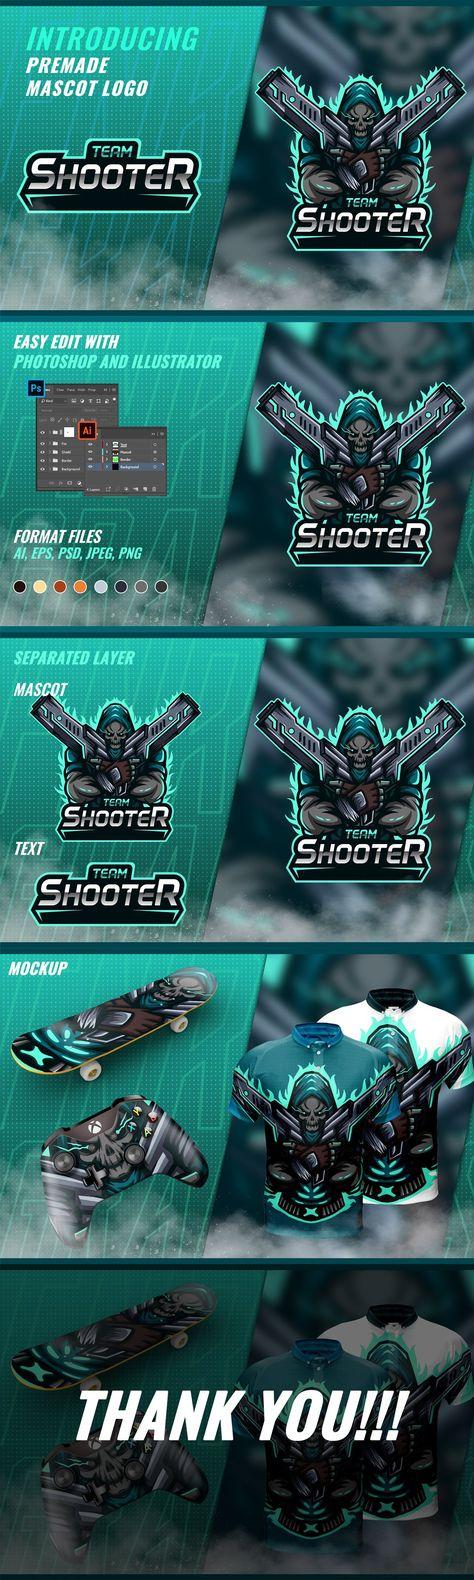 Team Shooter - ESport & Mascot Logo